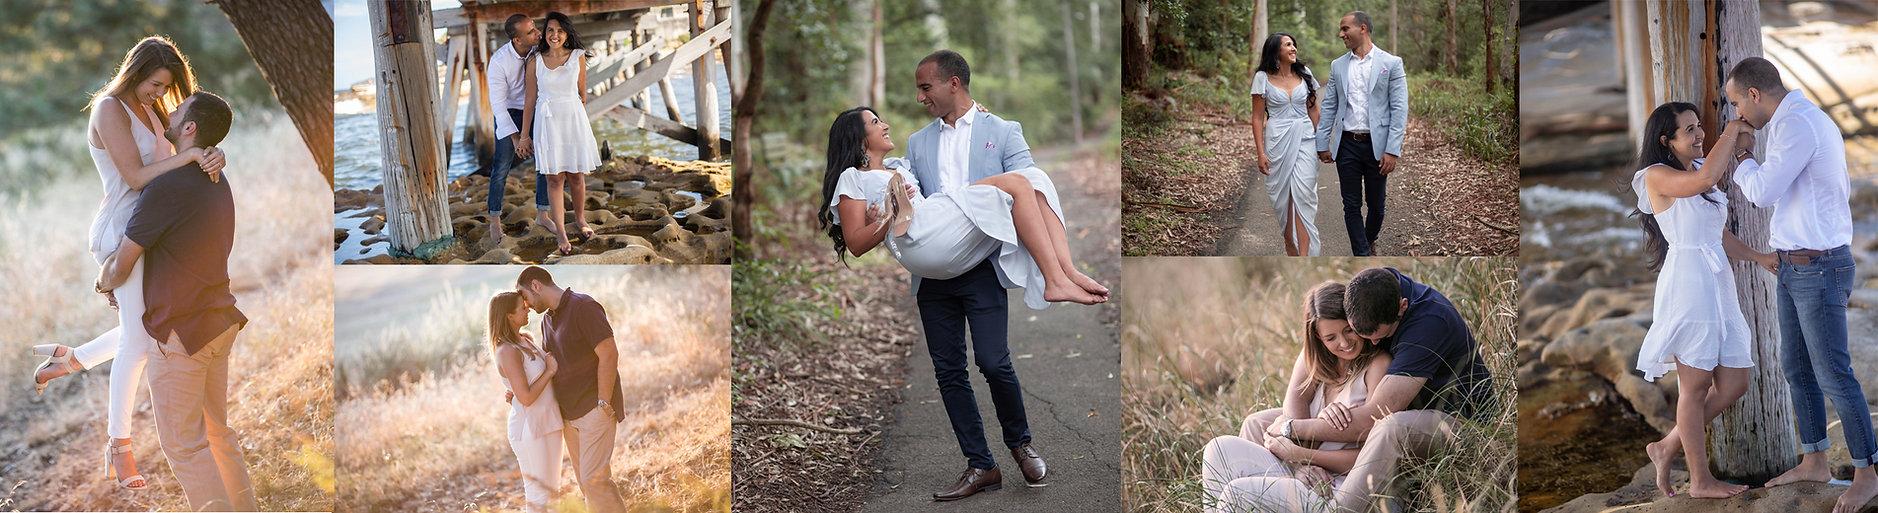 engagement collage.jpg